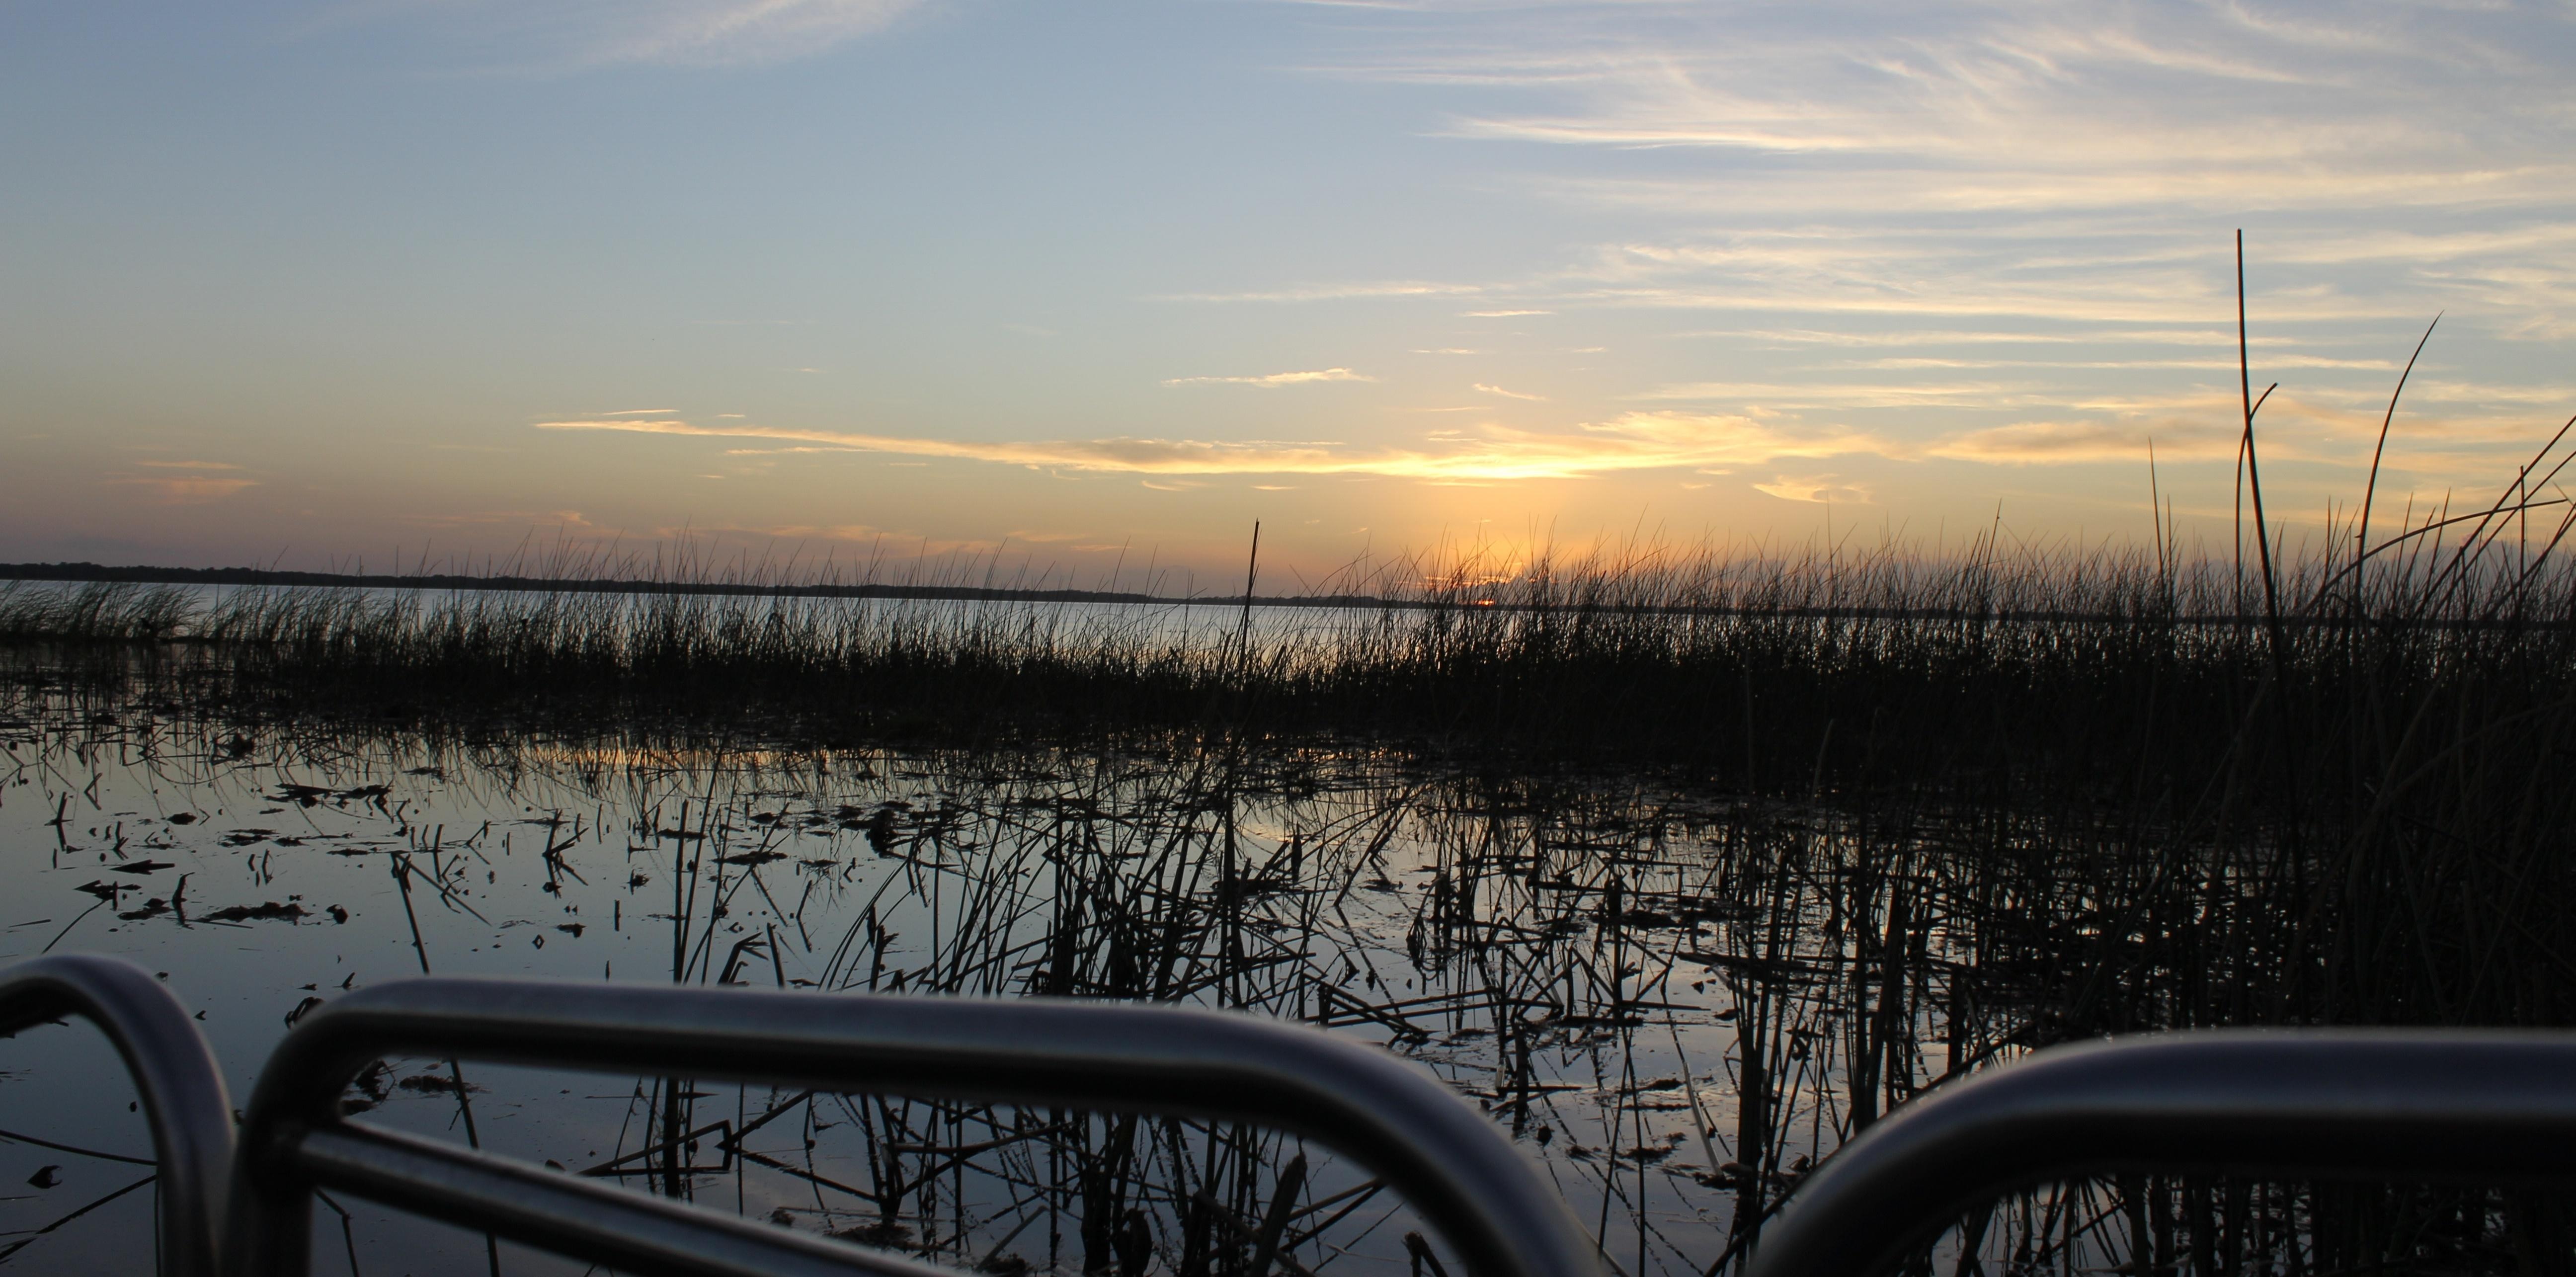 Everglades airboat ride